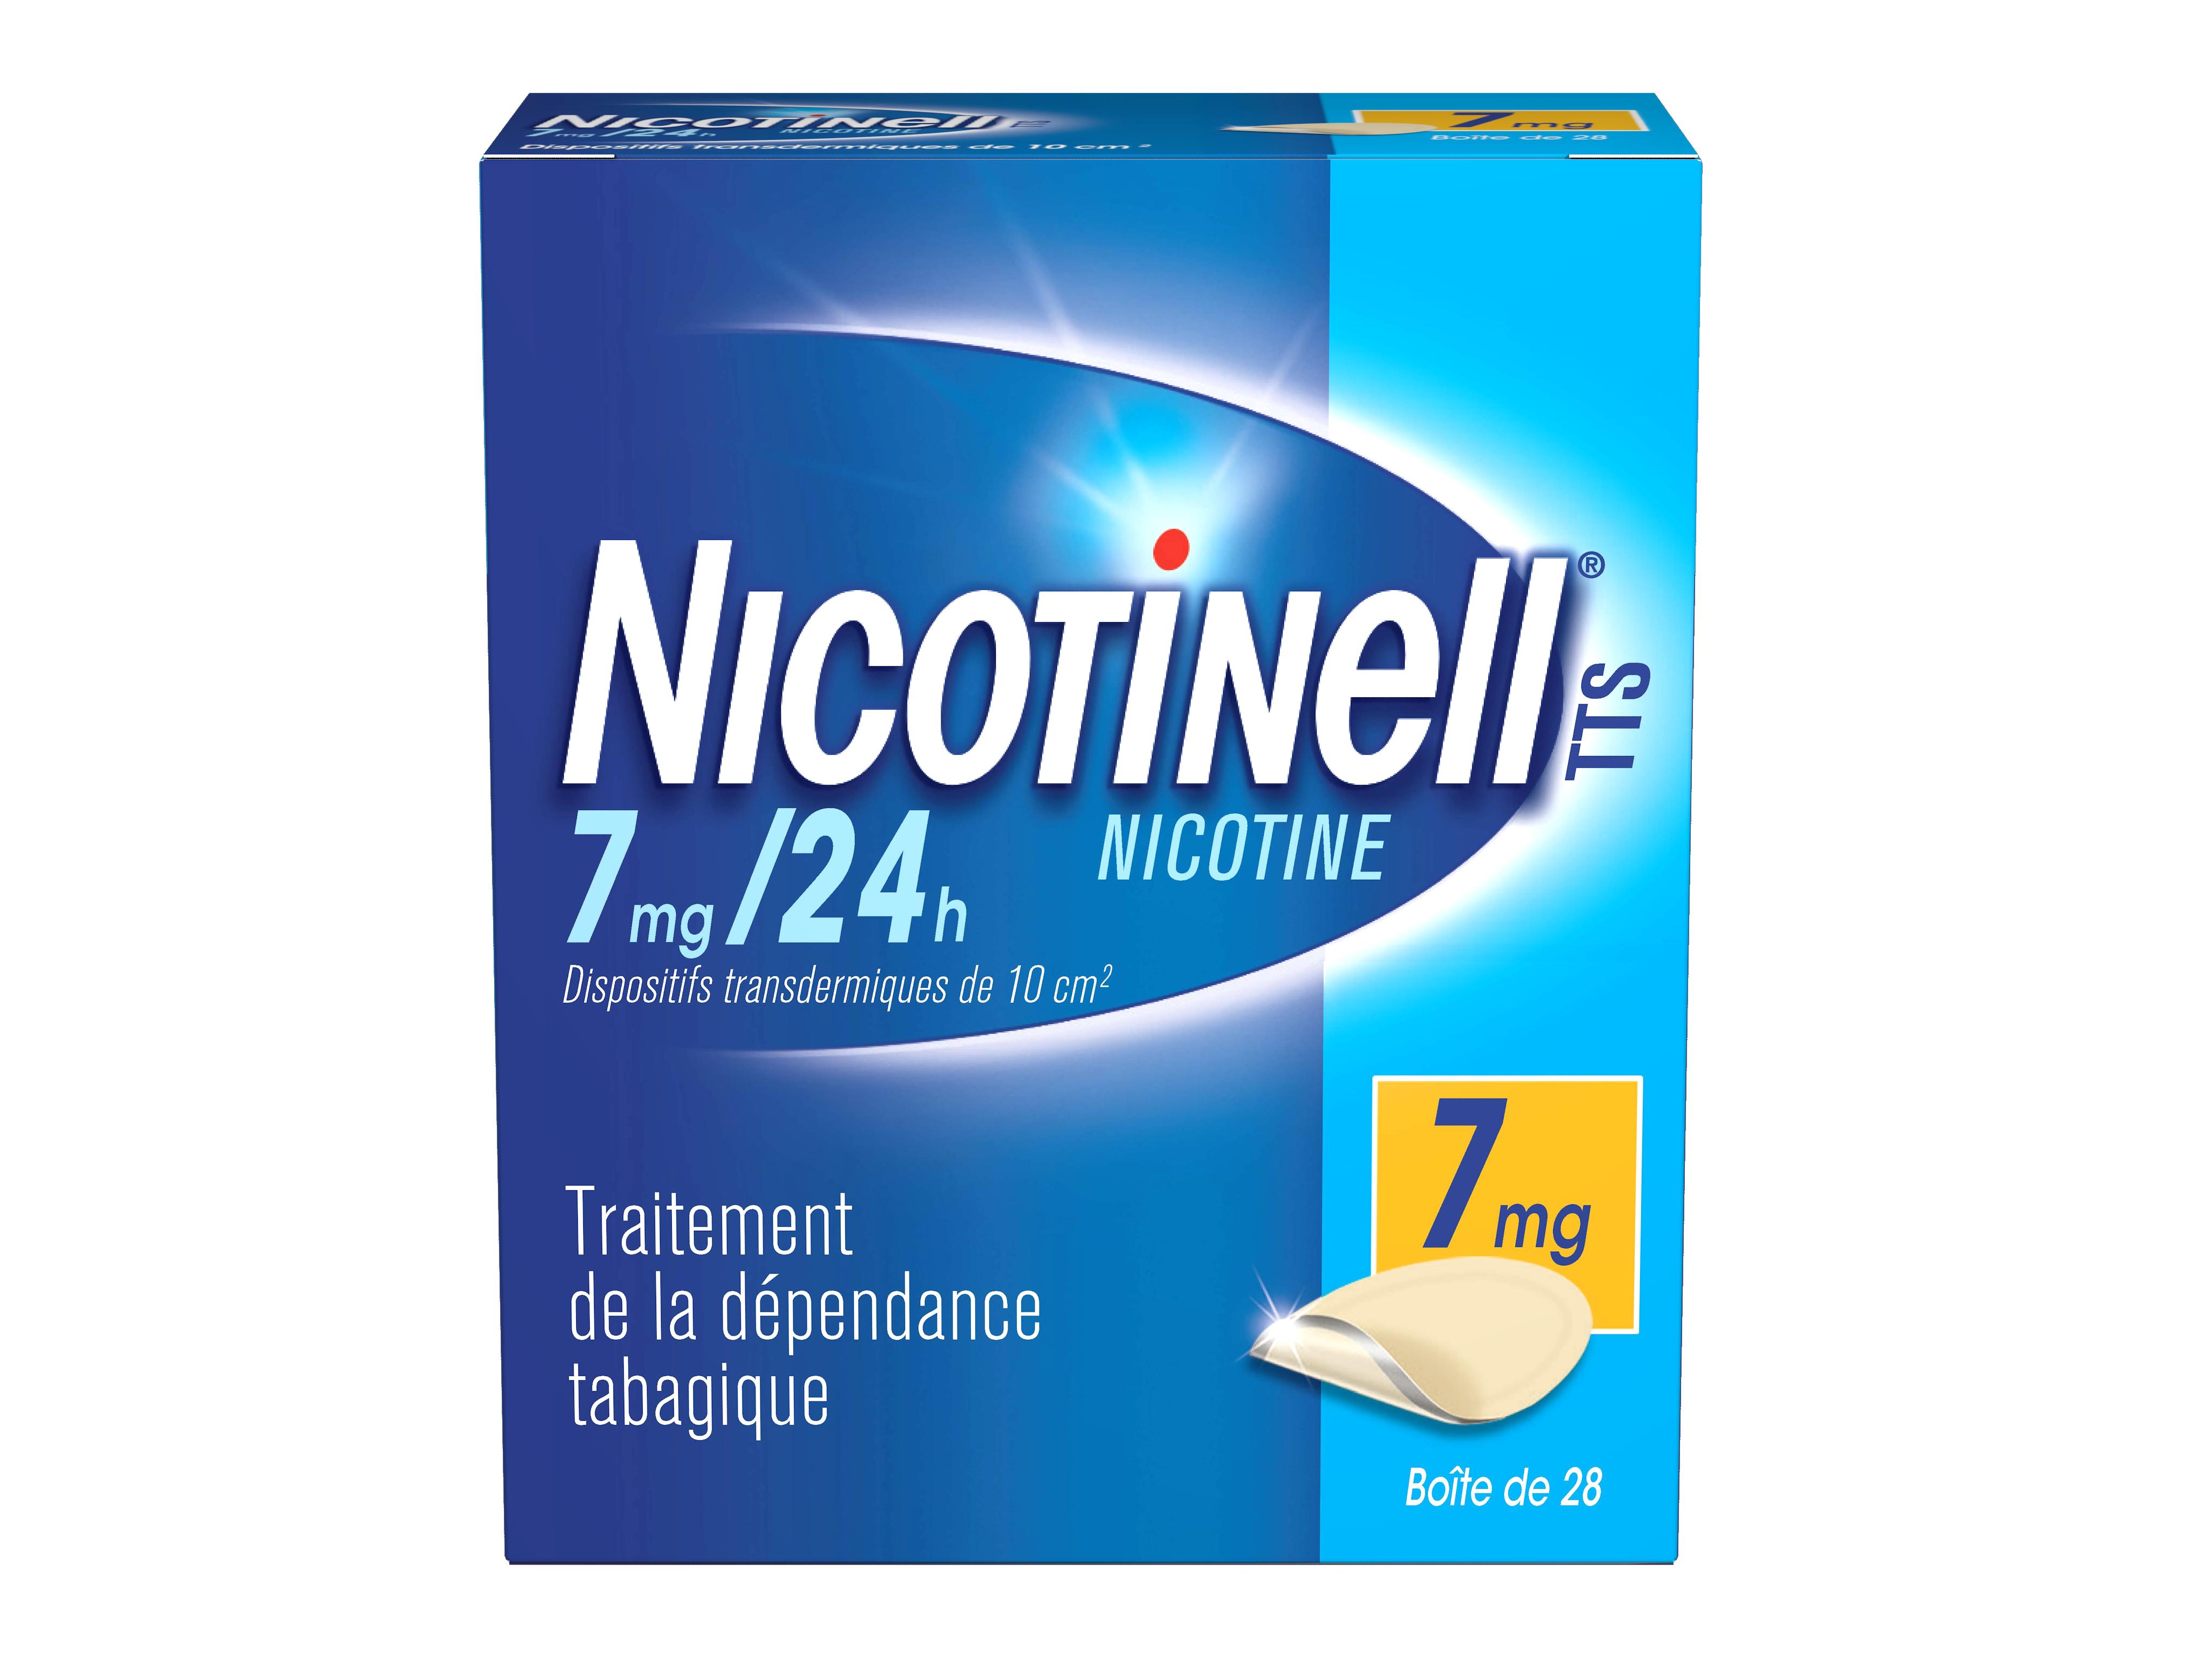 Image NICOTINELL TTS 7 mg/24 h Disp transderm B/28